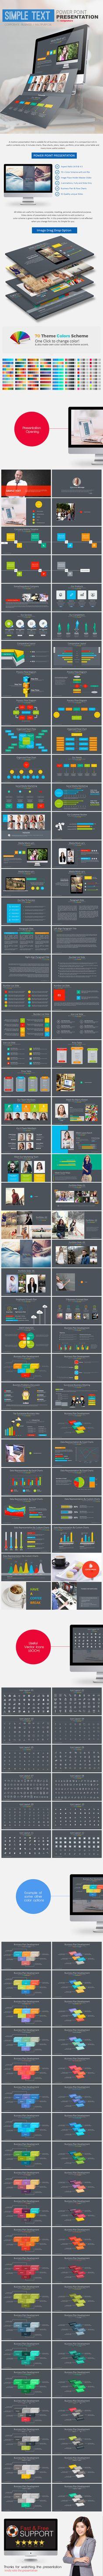 Concept Powerpoint Template | Windows powerpoint, Business ...